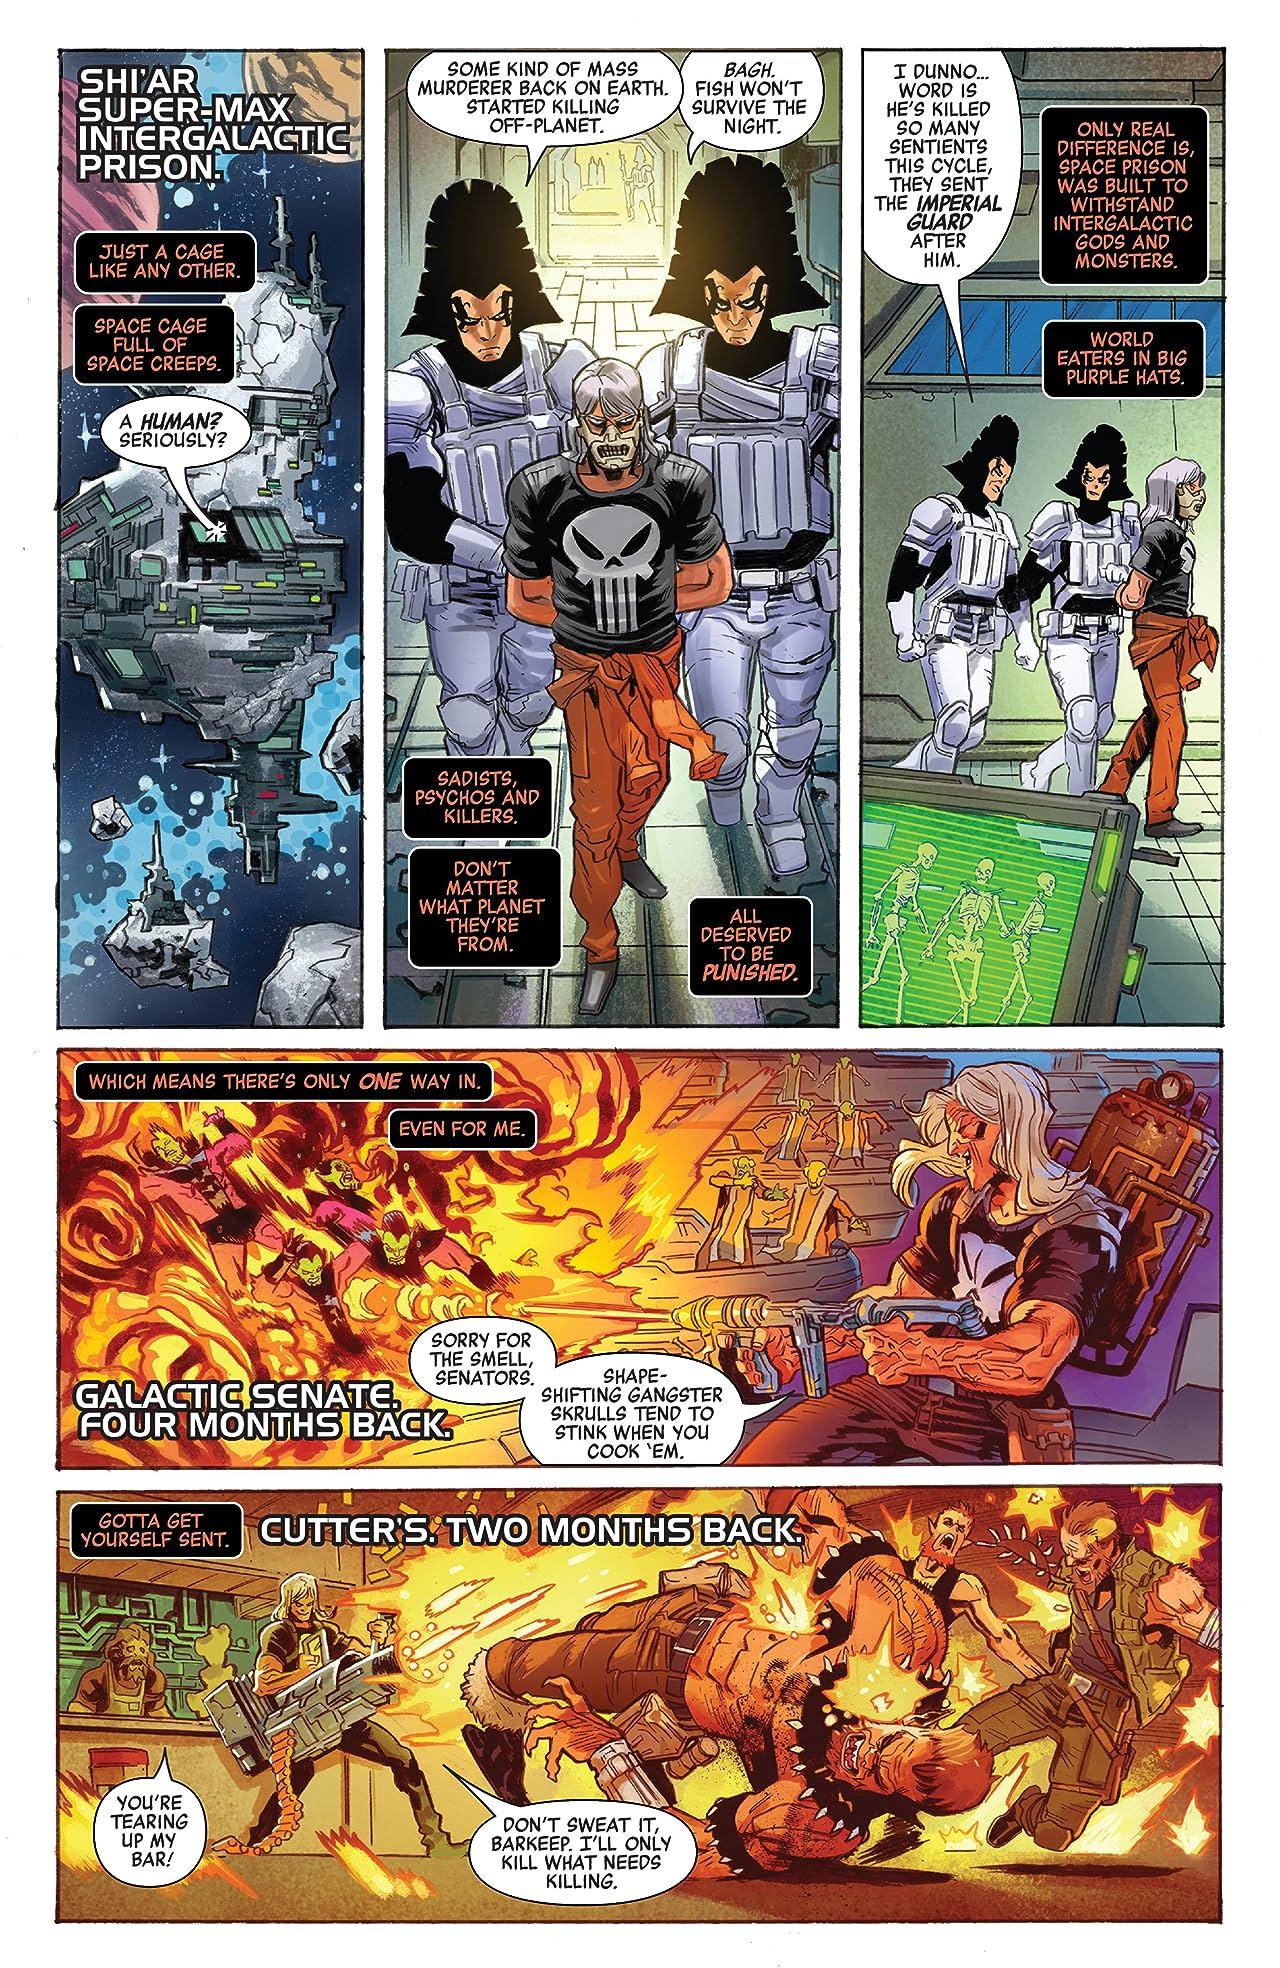 Revenge Of The Cosmic Ghost Rider (2019-) #1 (of 5)